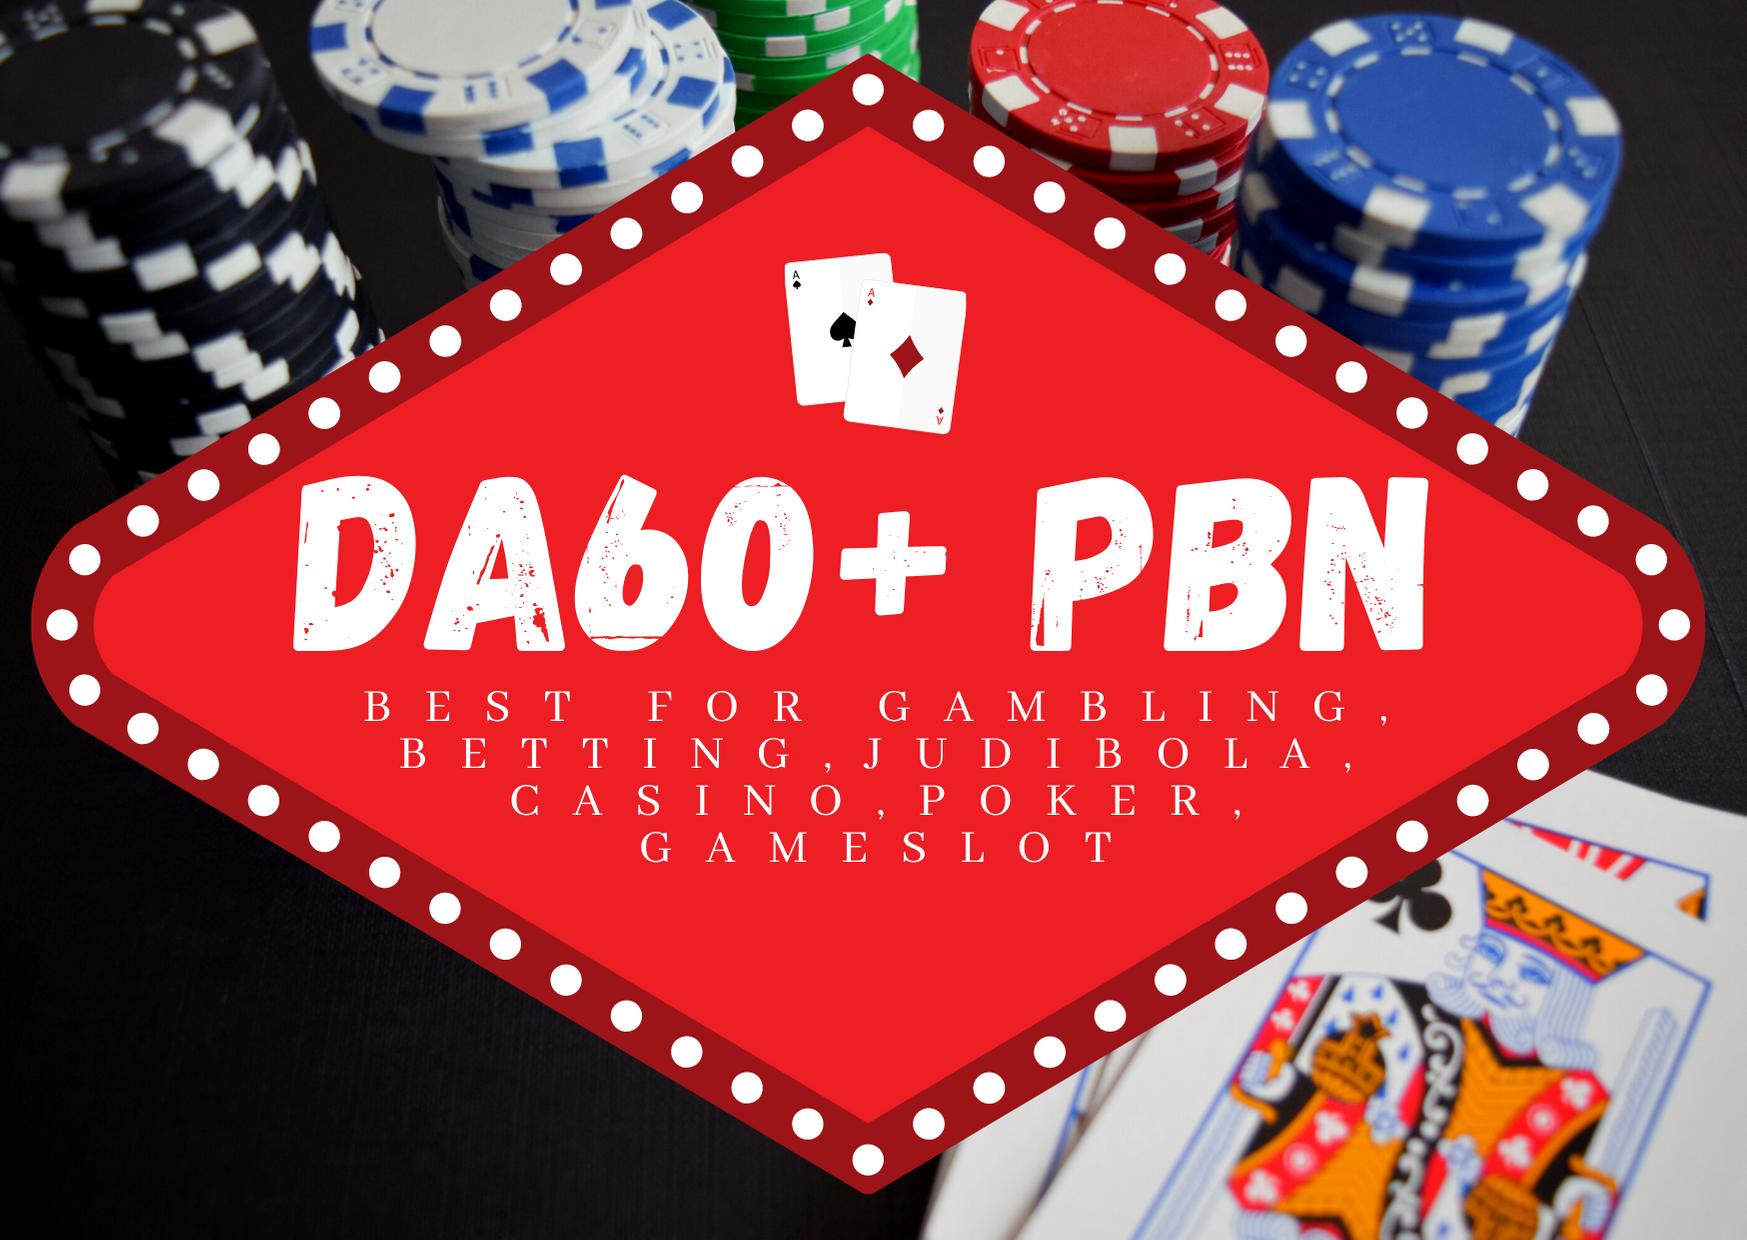 15 DA60+ PBN Backlinks For Gambling,  Betting,  Judi Bola,  Casino,  Poker,  Gameslot